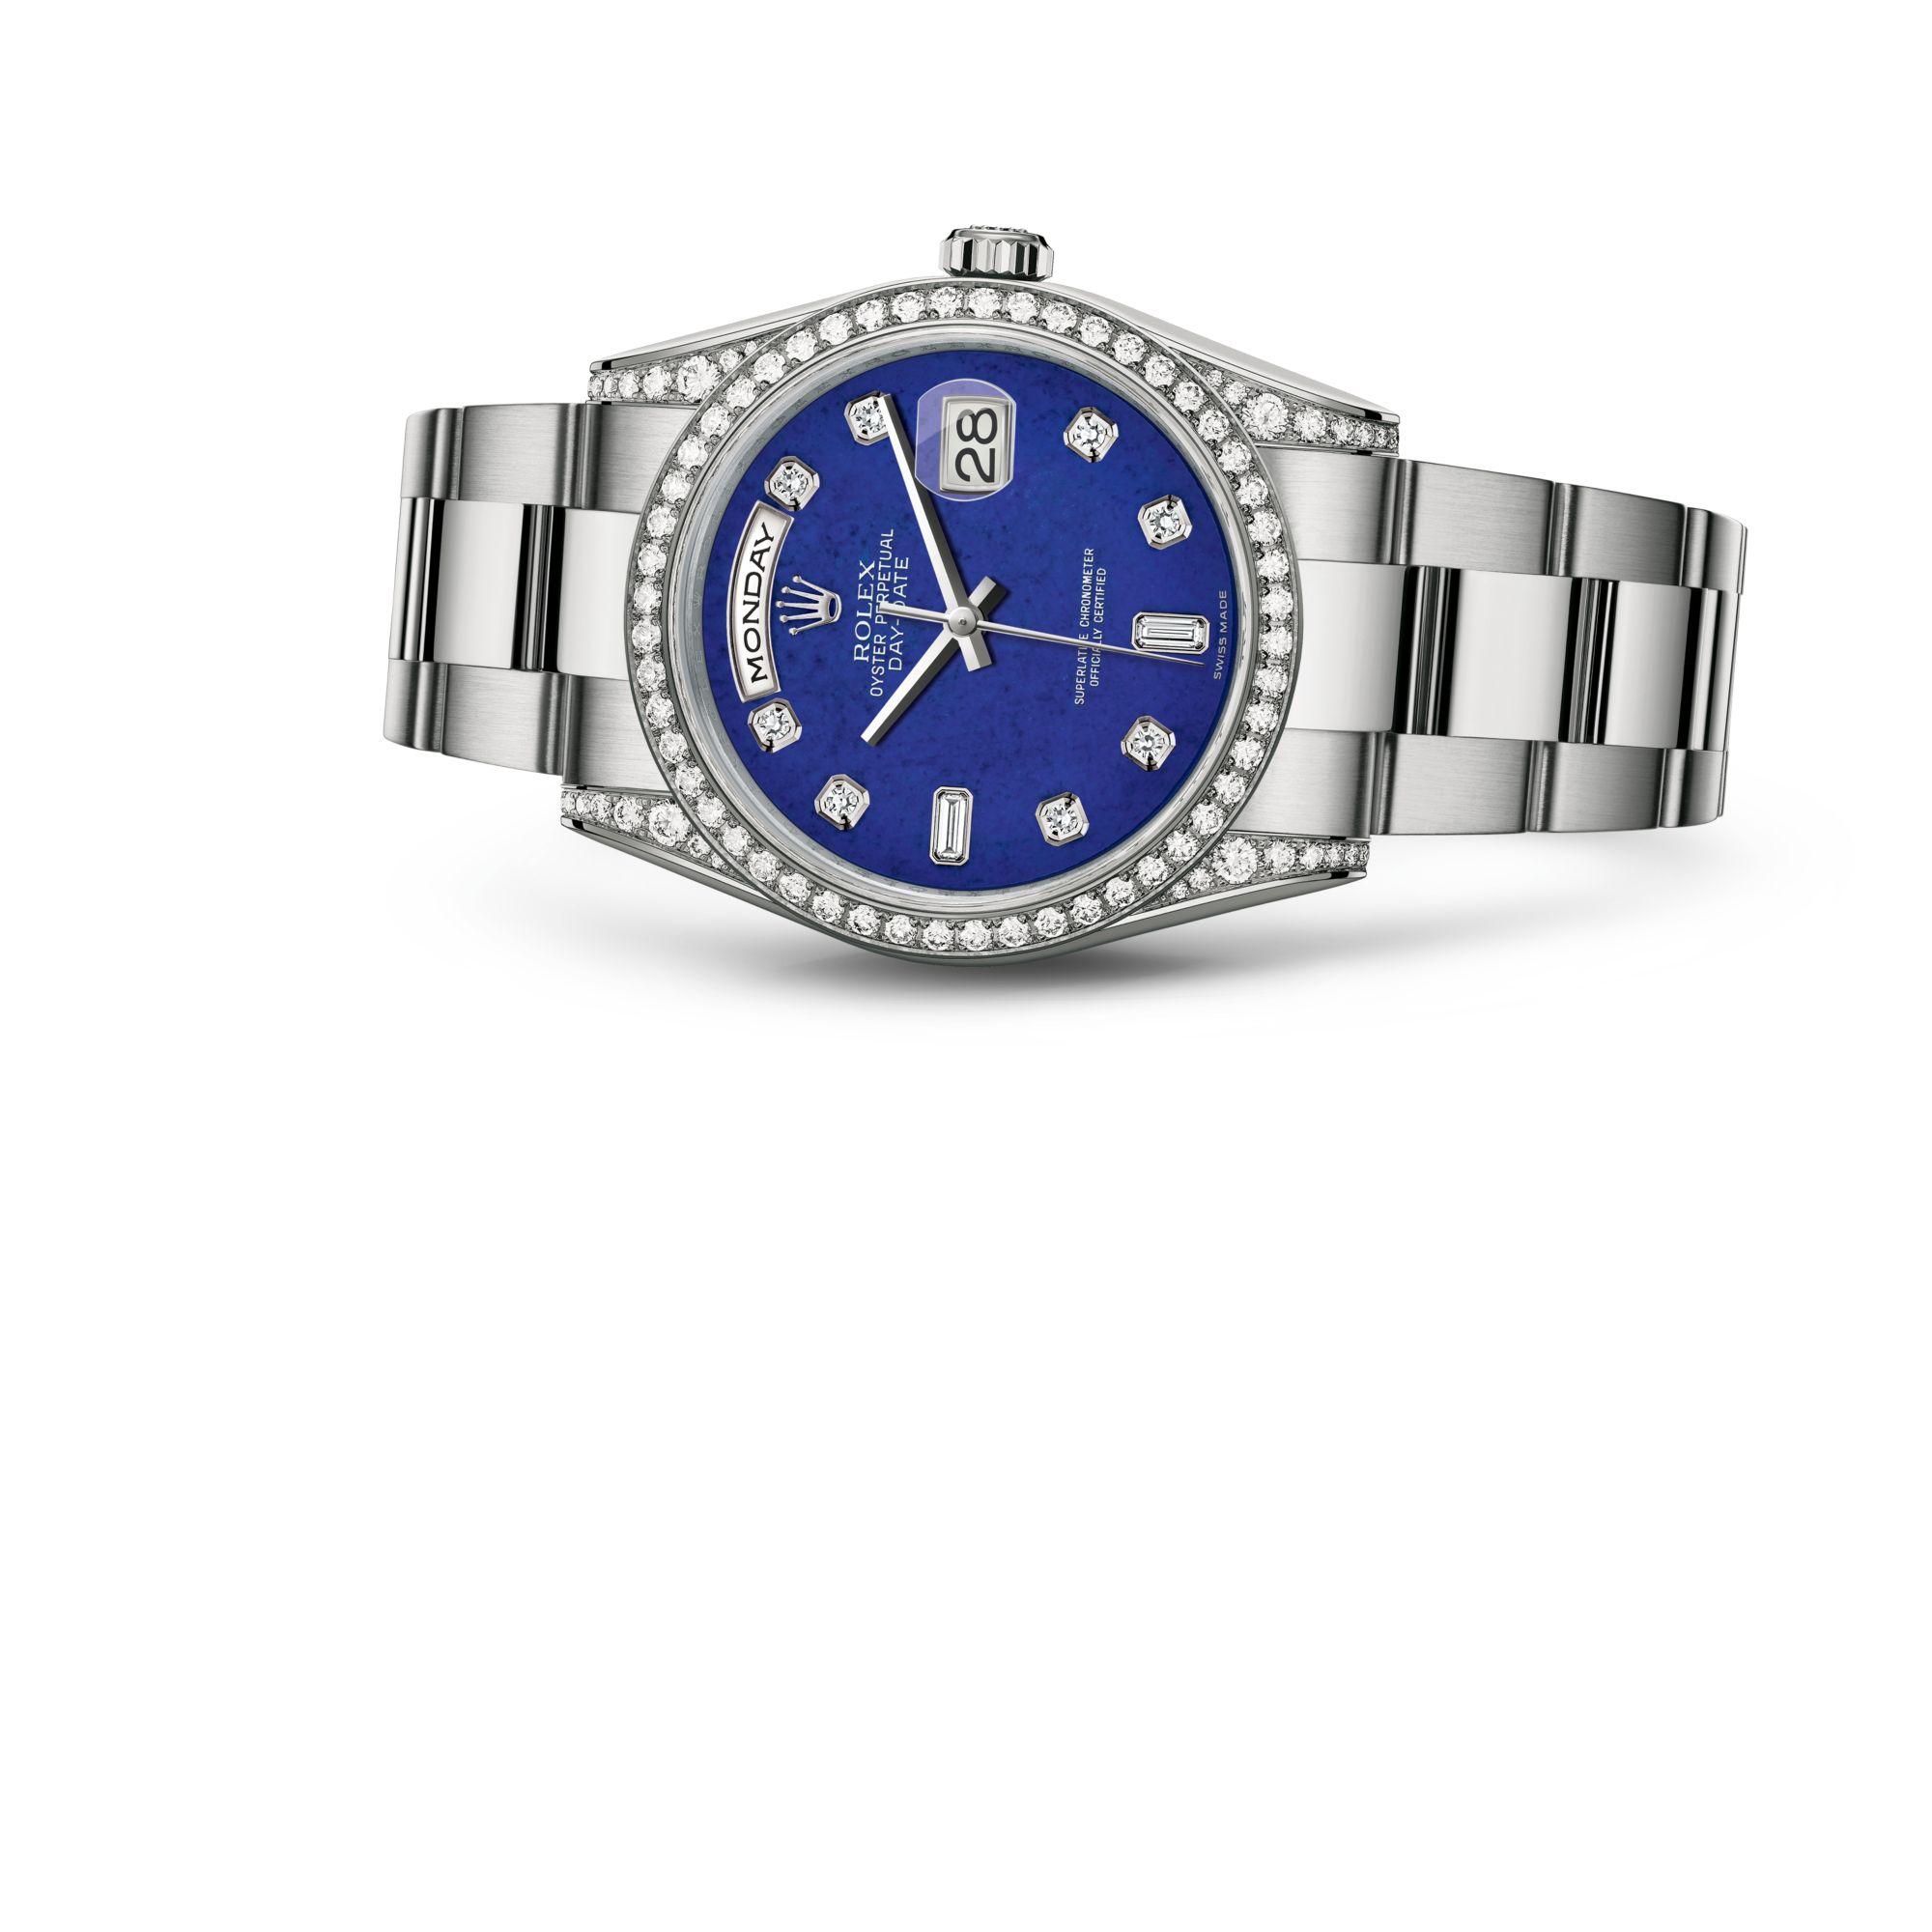 Rolex داي ديت ۳٦ M118389-0086